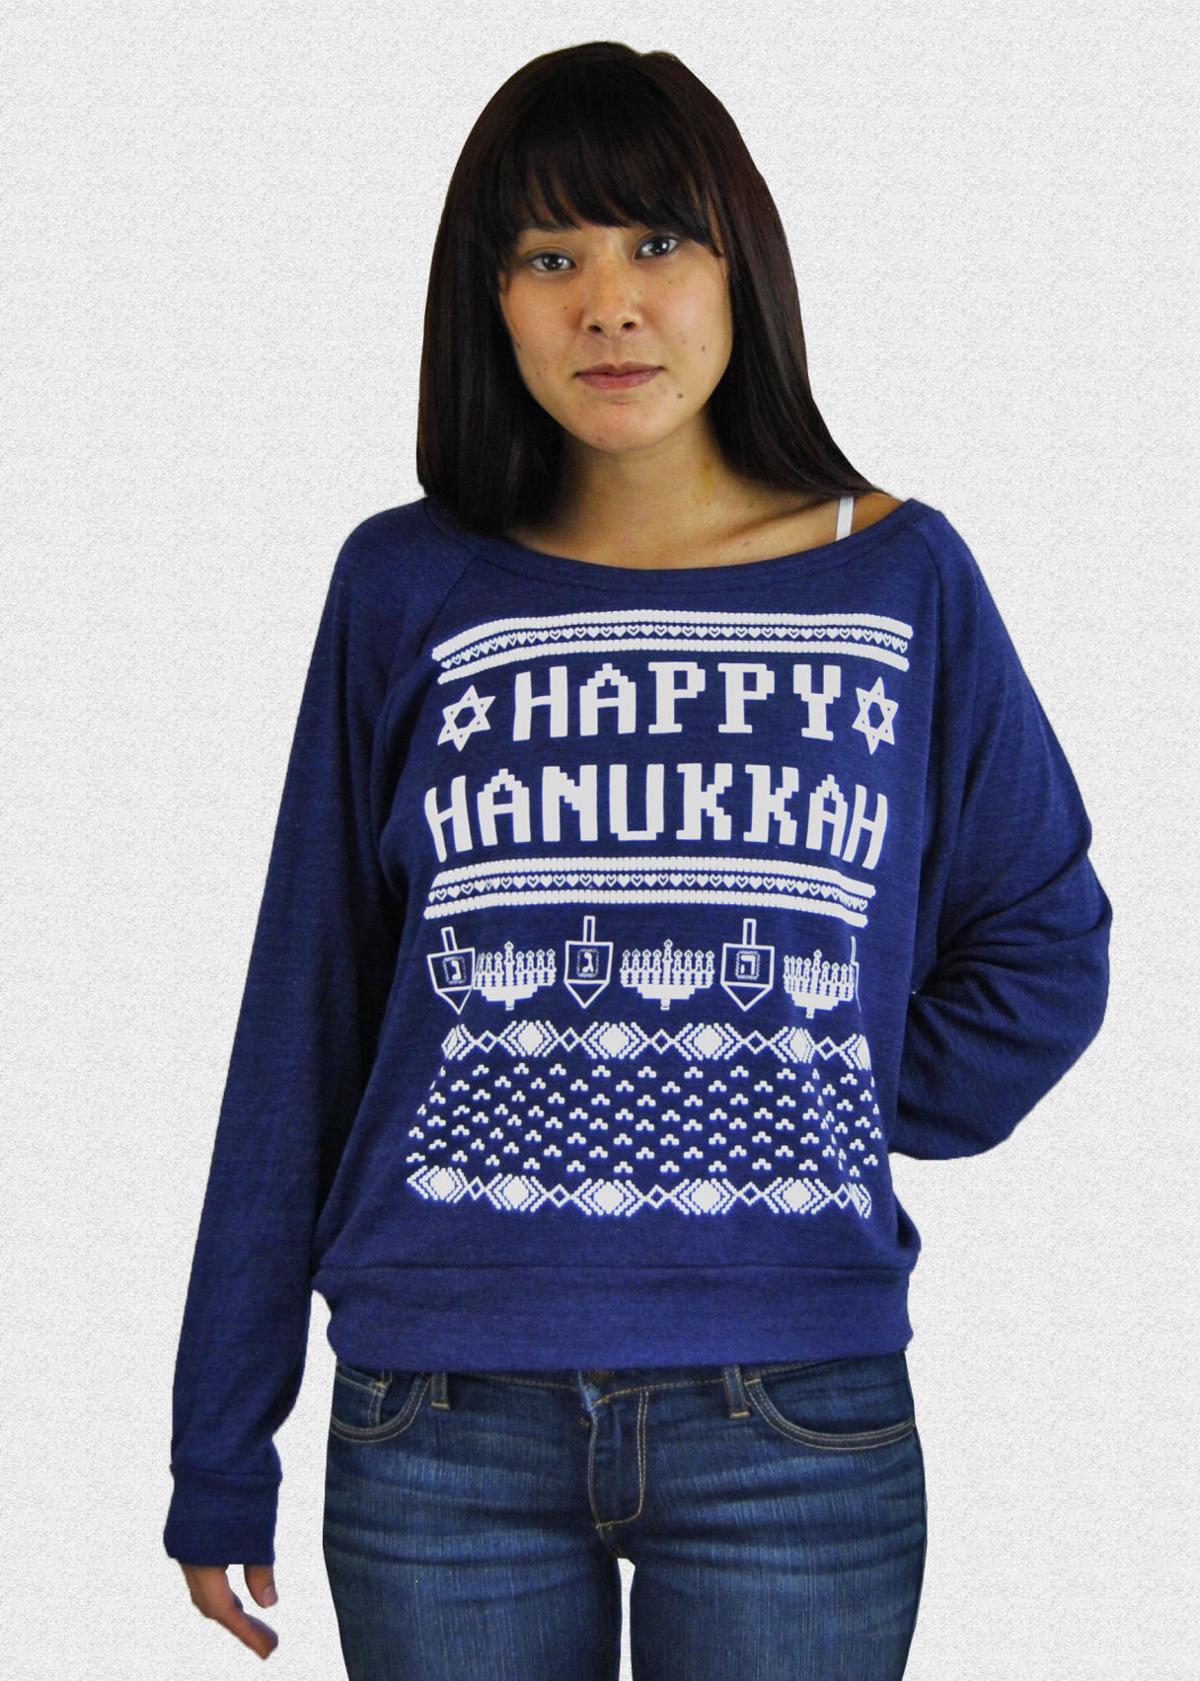 Chanukah knitwear – it can be found anywhere, everywhere | Chanukah ...